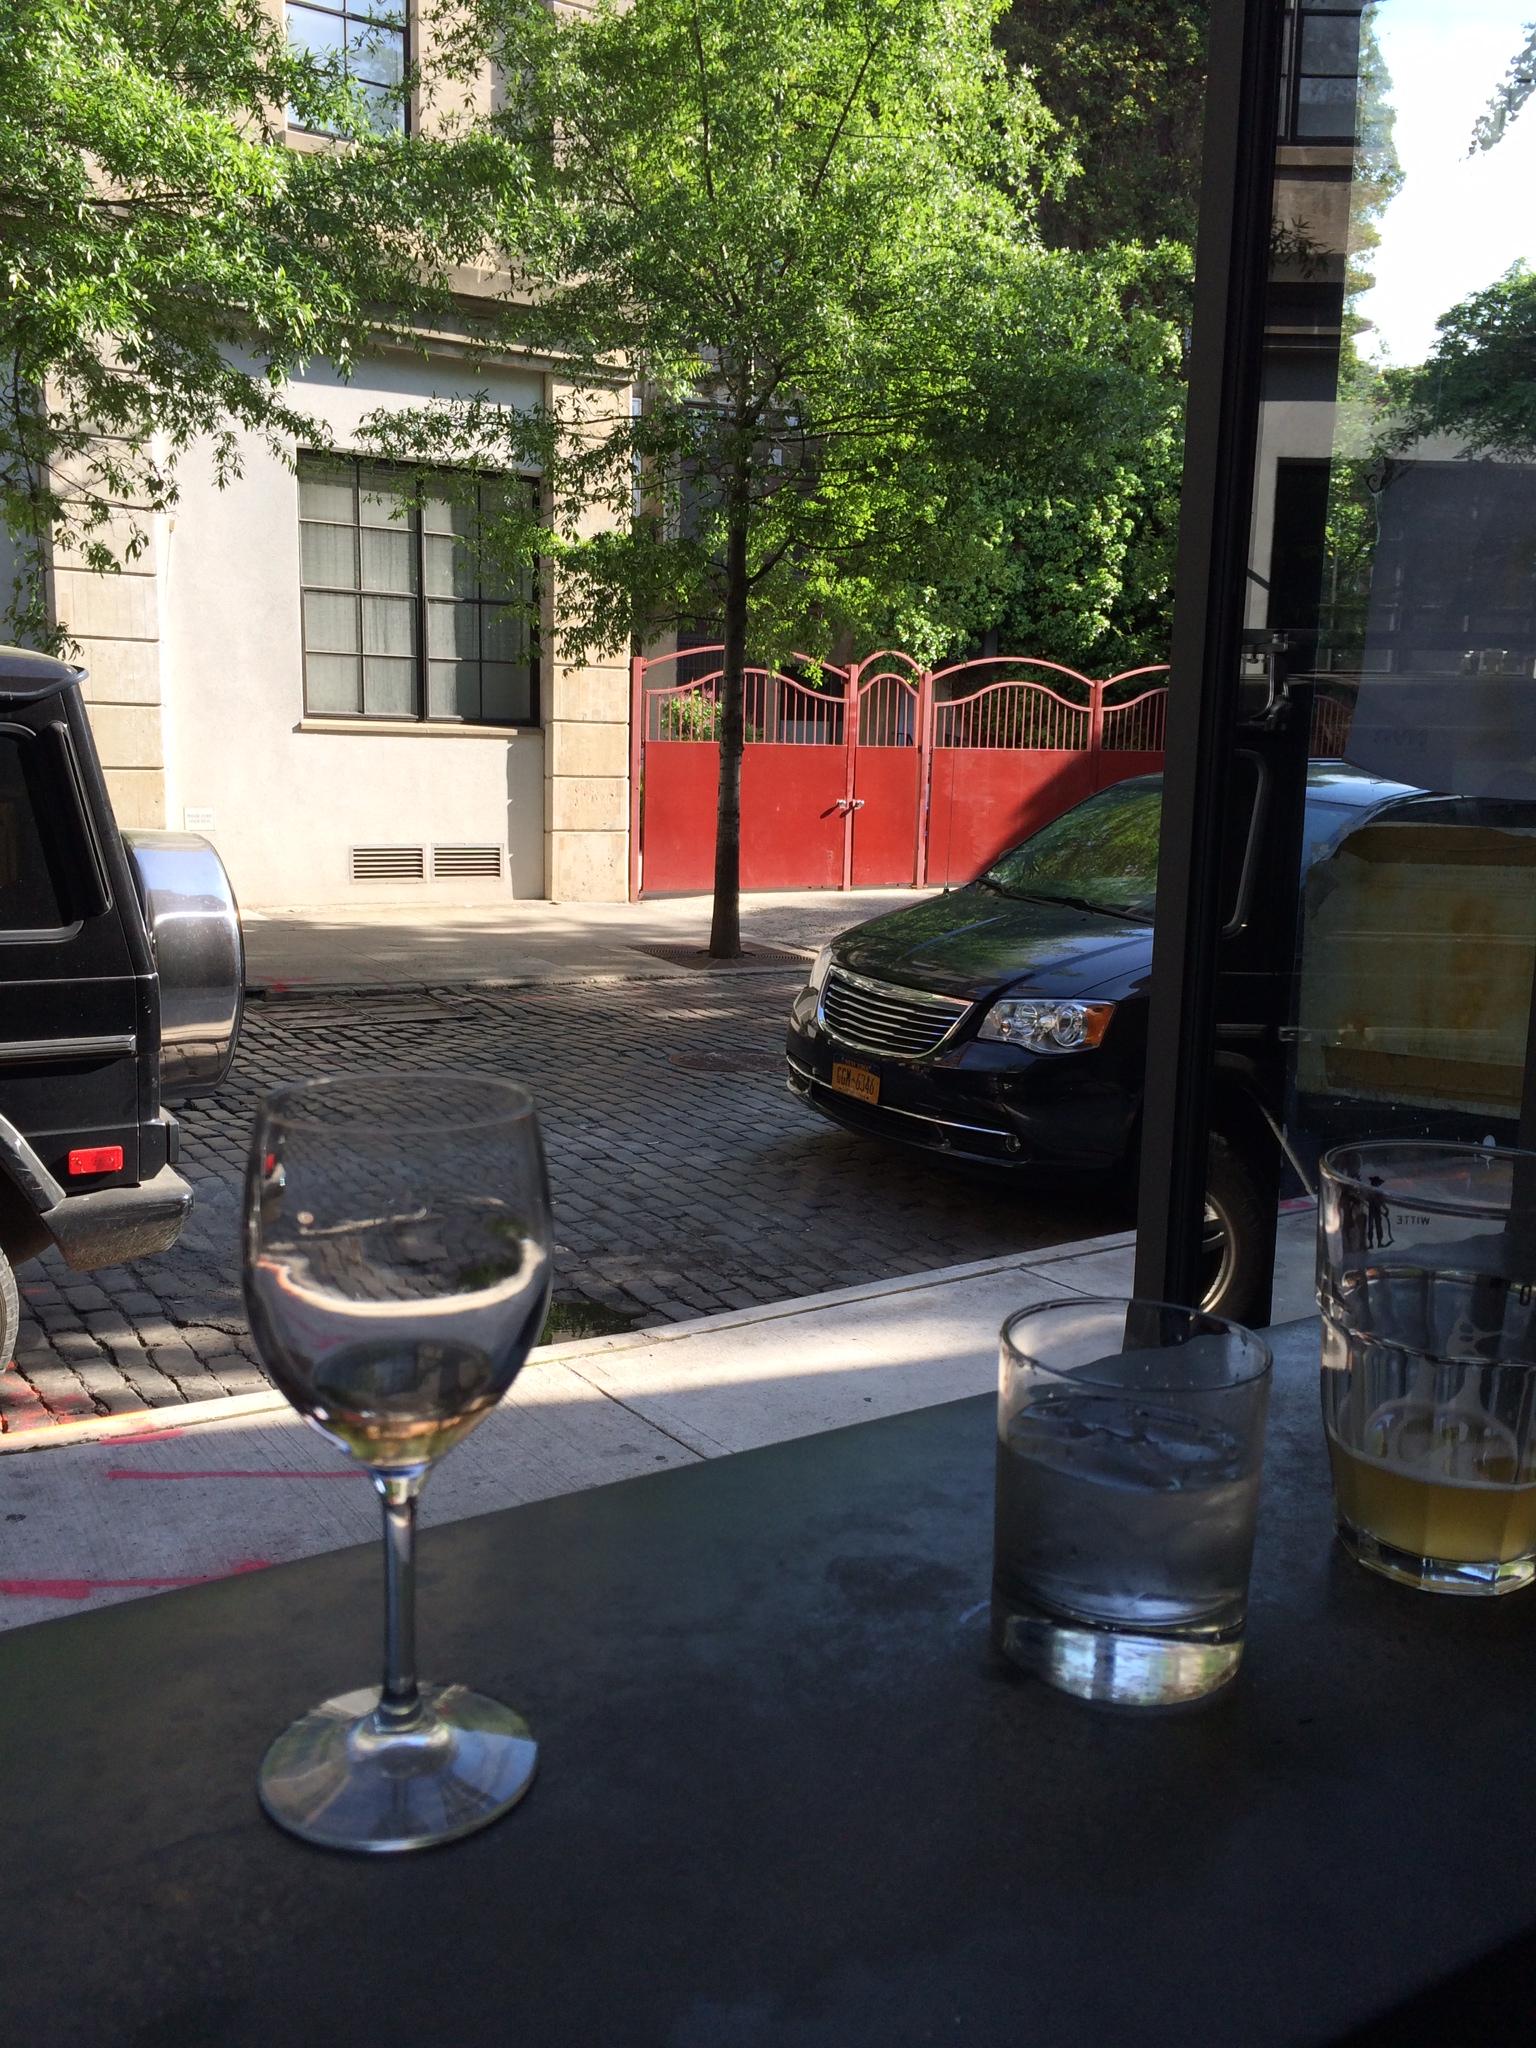 Cooling off at our favorite West Village bar.